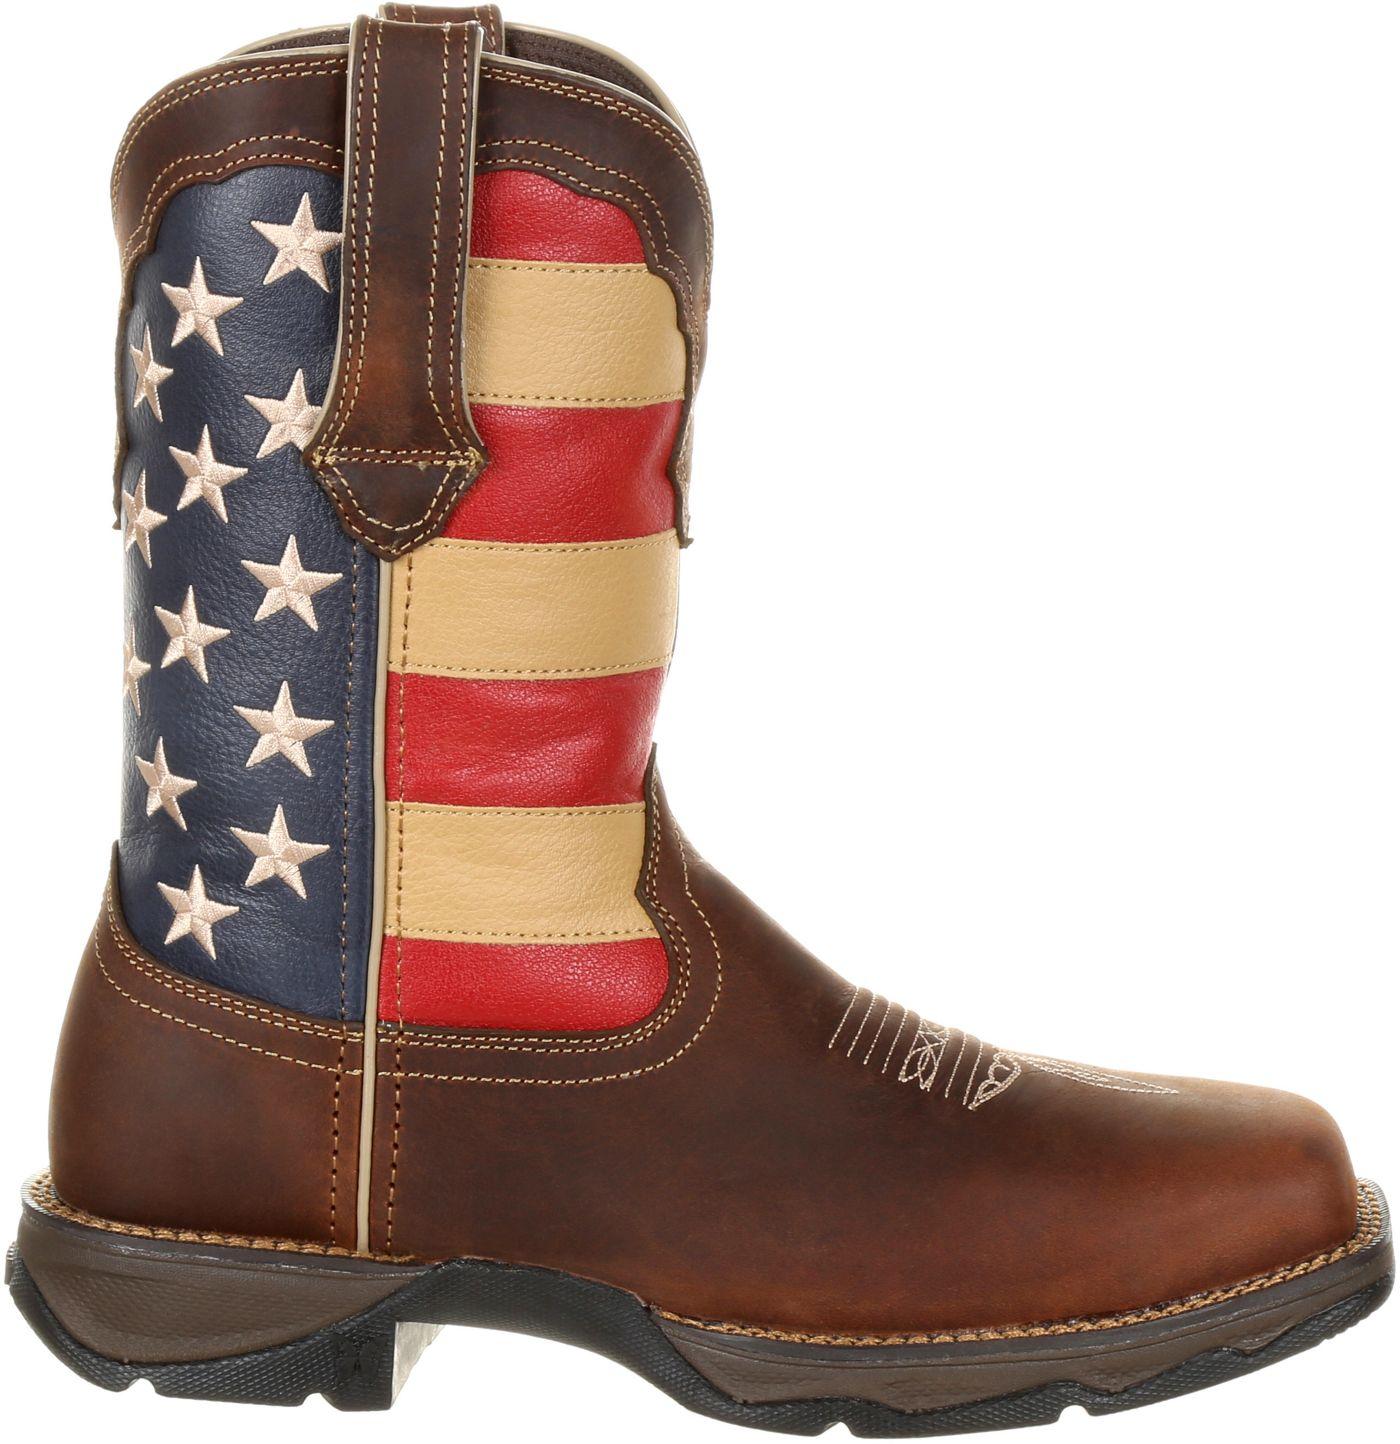 Durango Women's Lady Rebel Patriotic Flag Steel Toe Western Work Boots